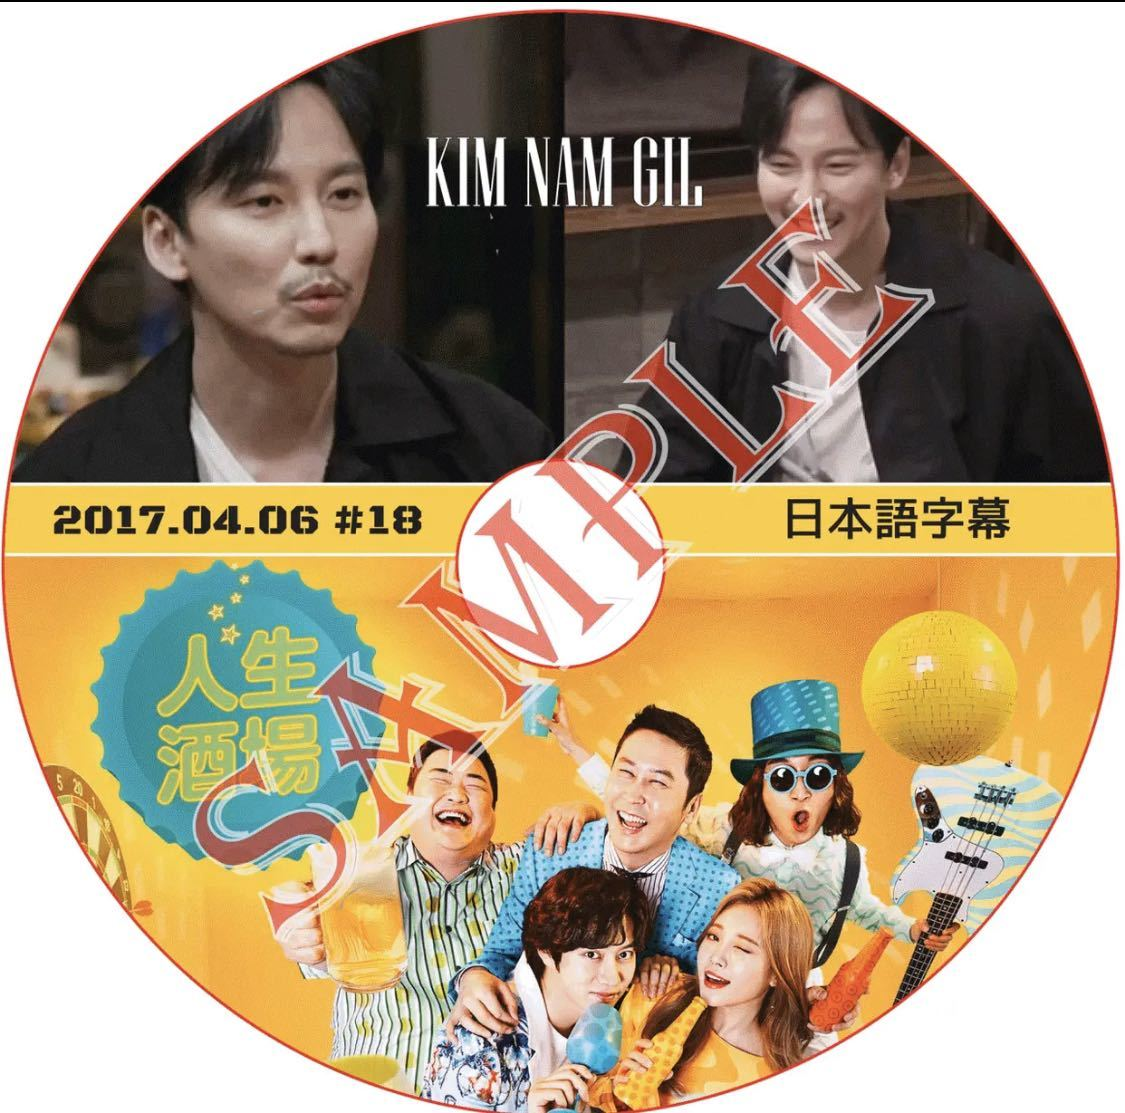 [K-POP DVD] キムナムギル 人生酒場 (2017.04.06) 日本語字幕 / KIM NAM GIL